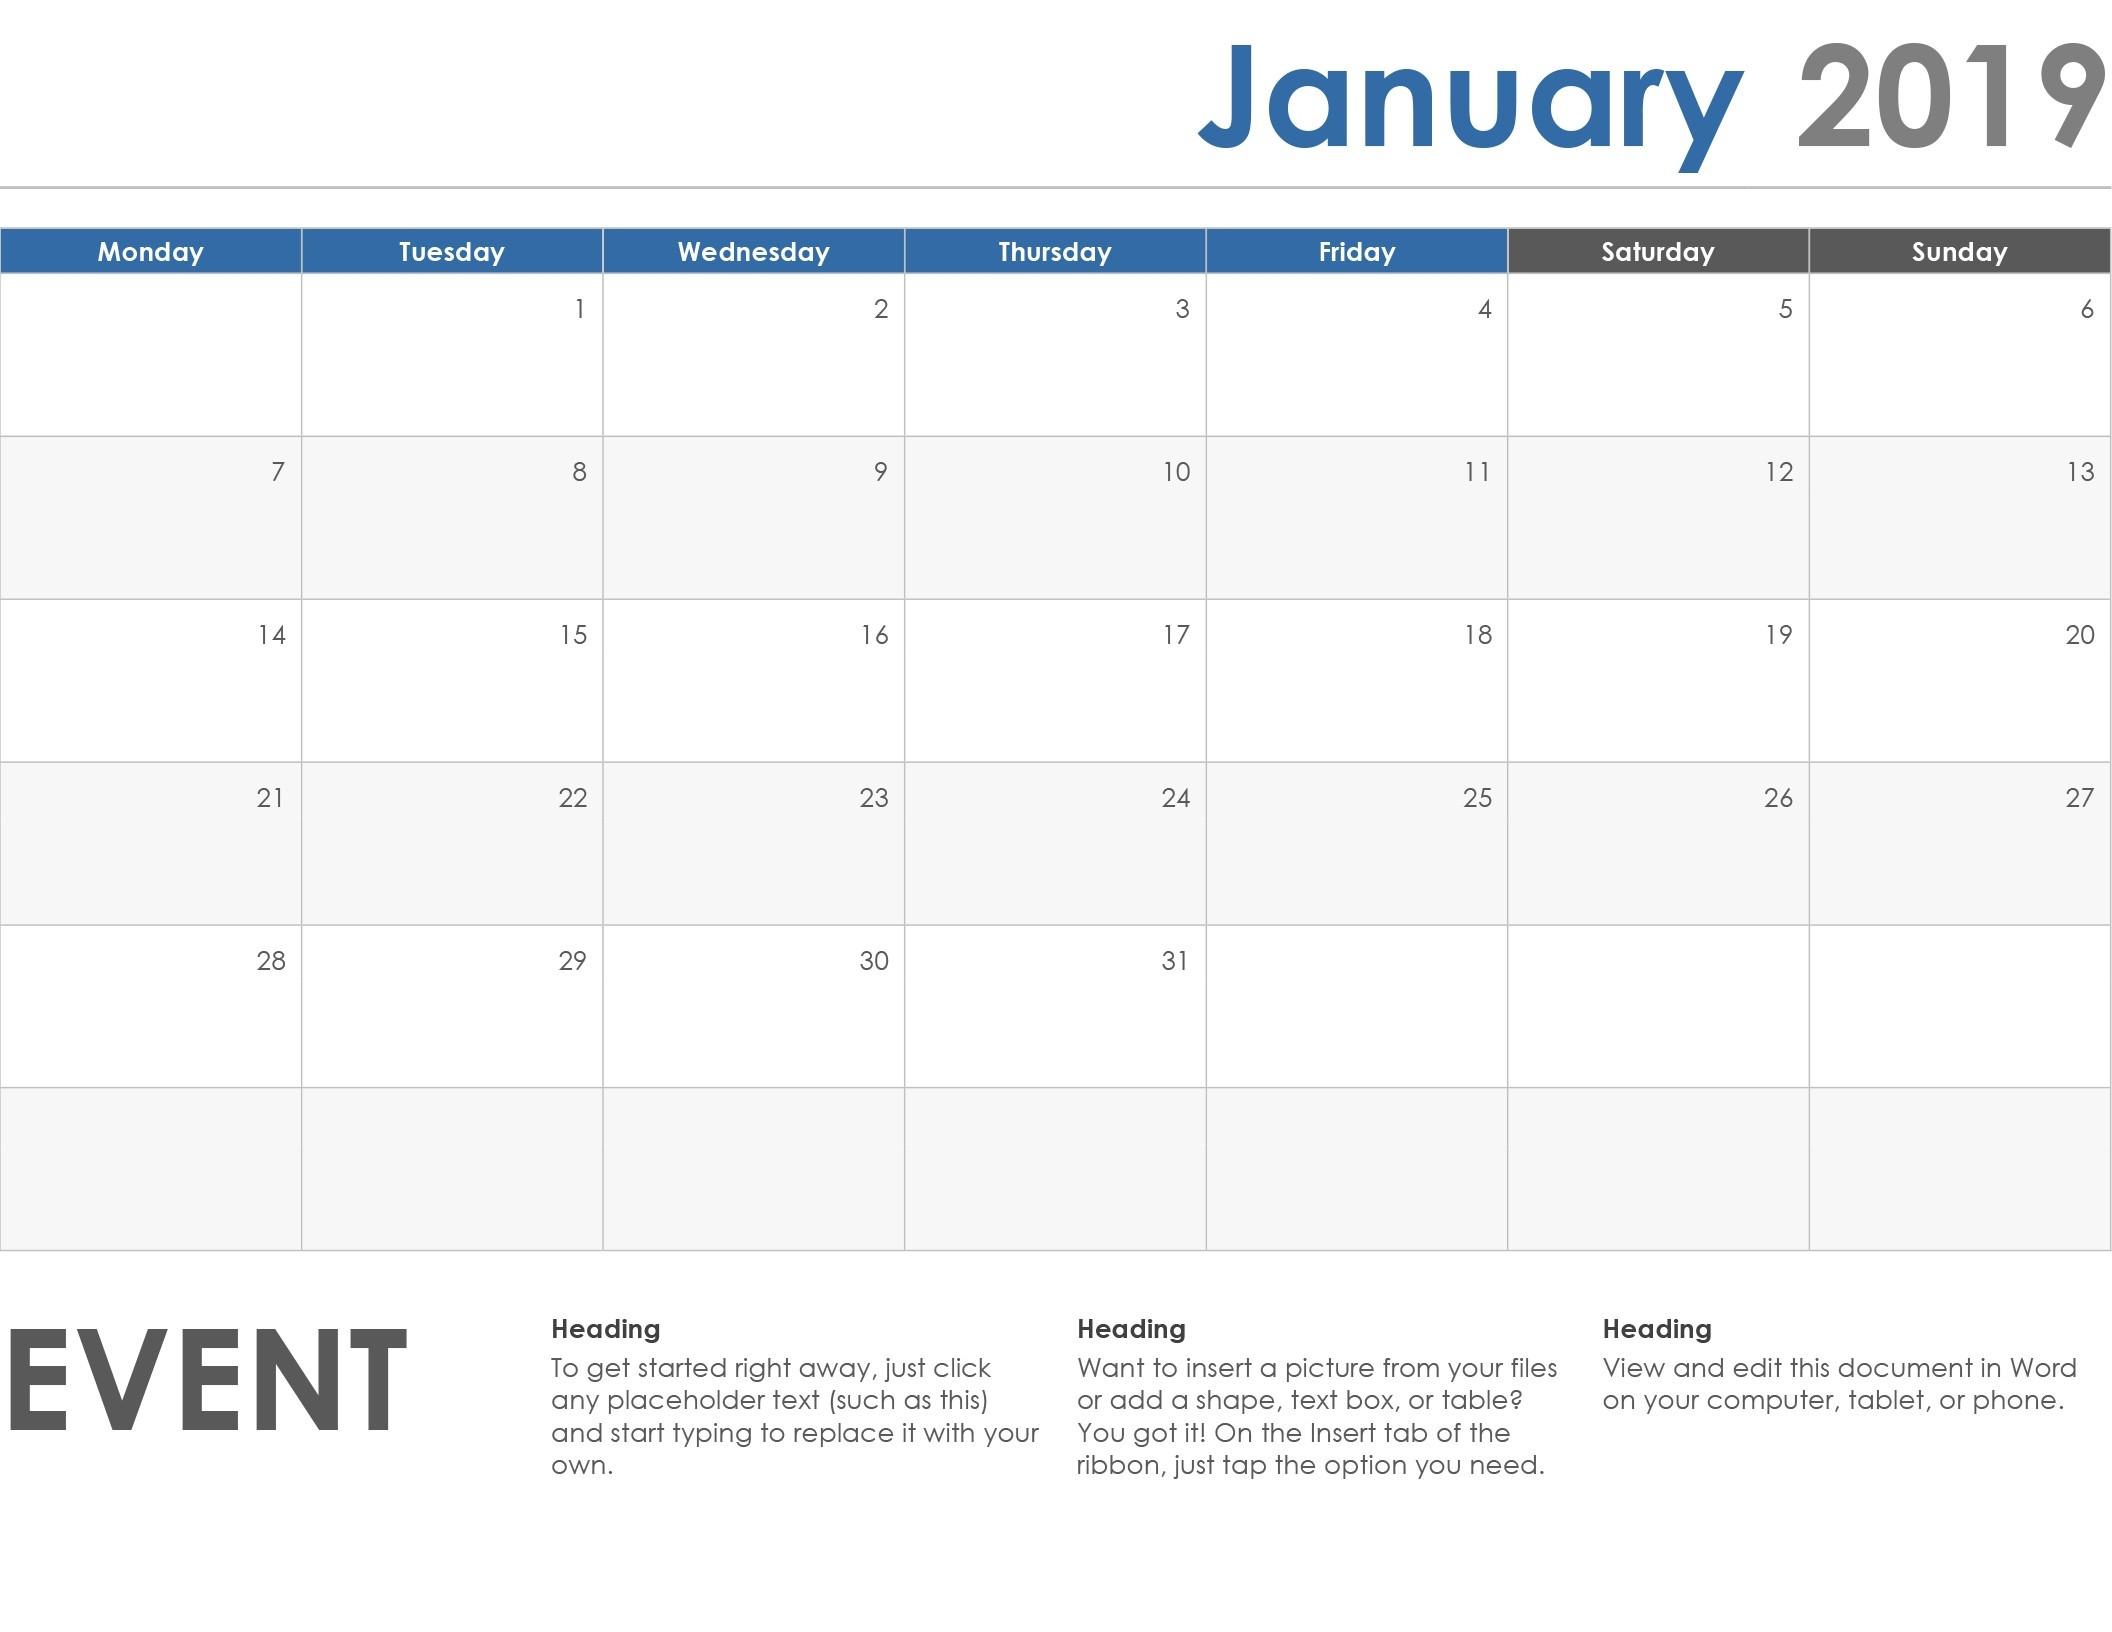 Monday To Friday Calendar Template | Calendar Template  Editable Monday-Friday Shedule